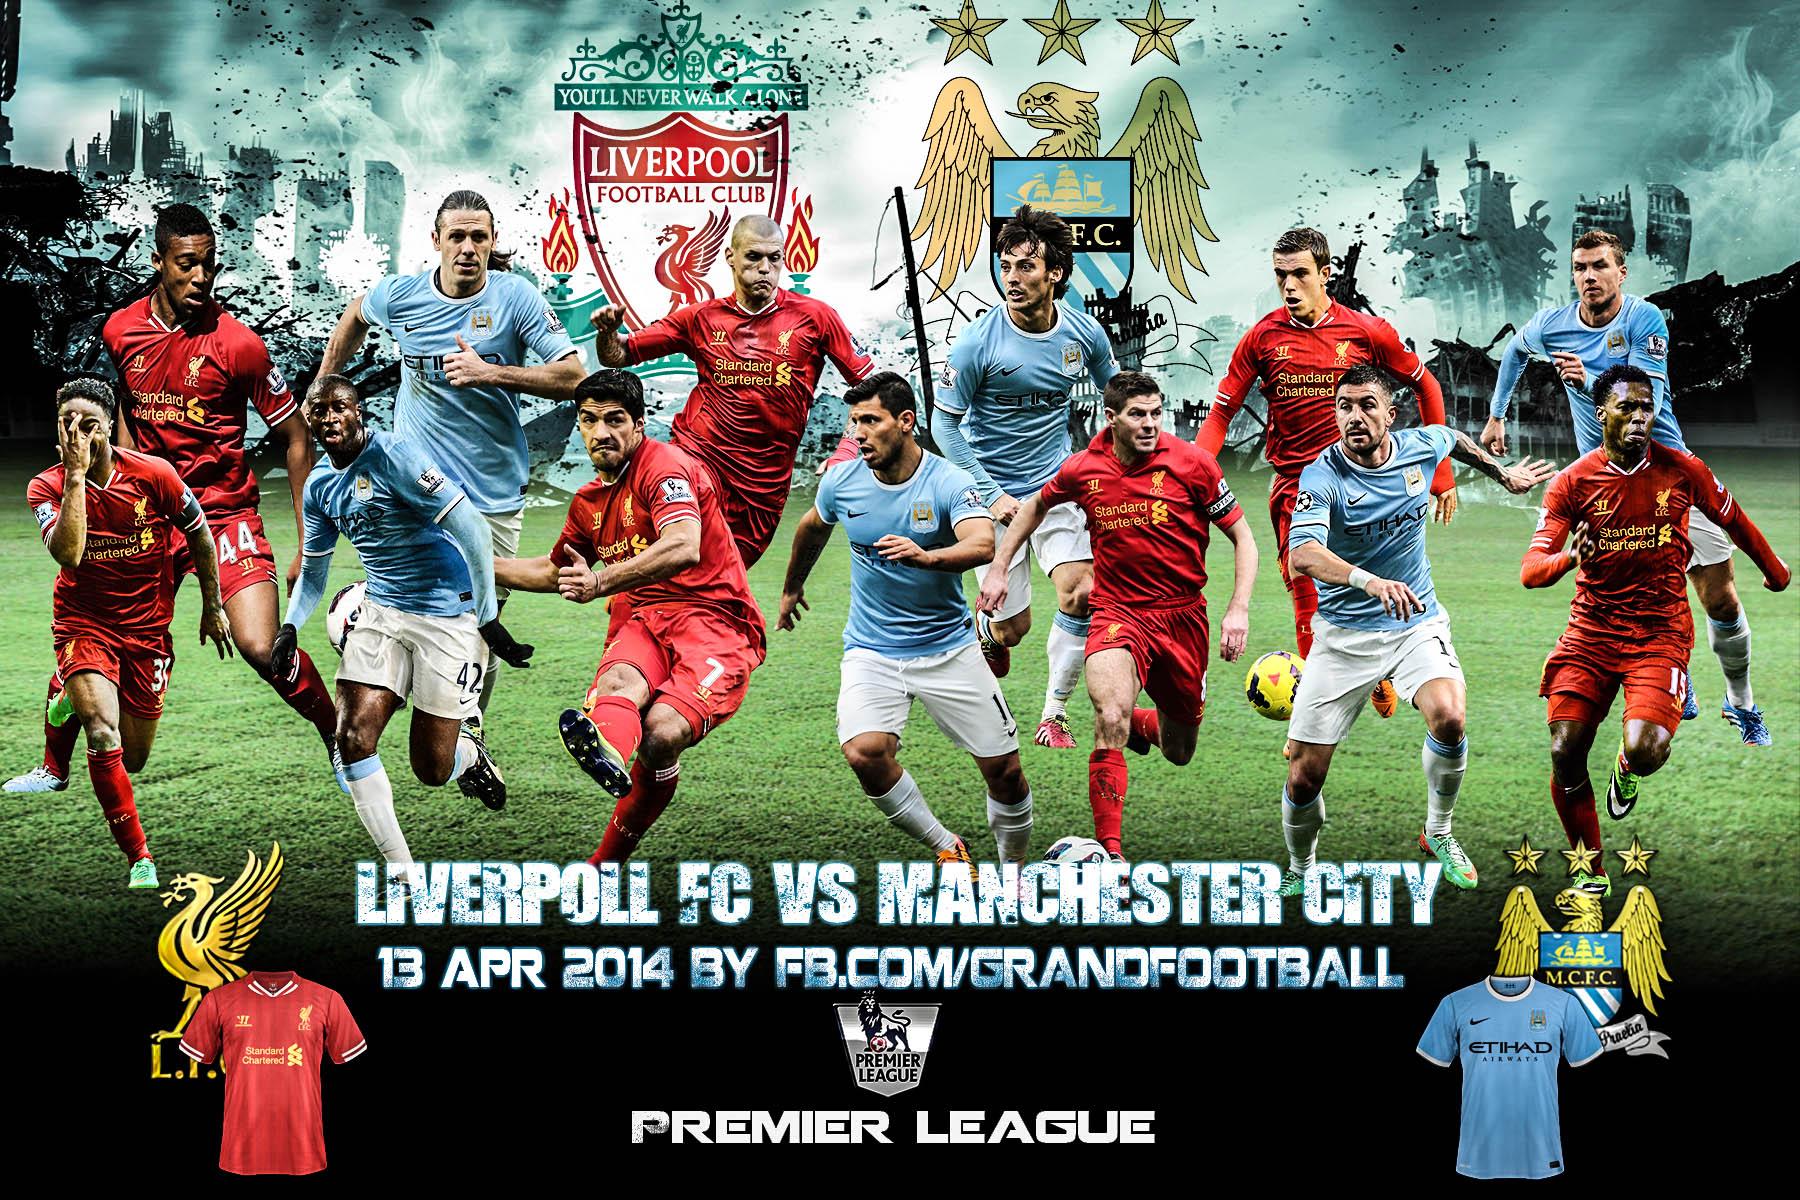 Liverpool Fc Vs Manchester City By Lionelkhouya On Deviantart